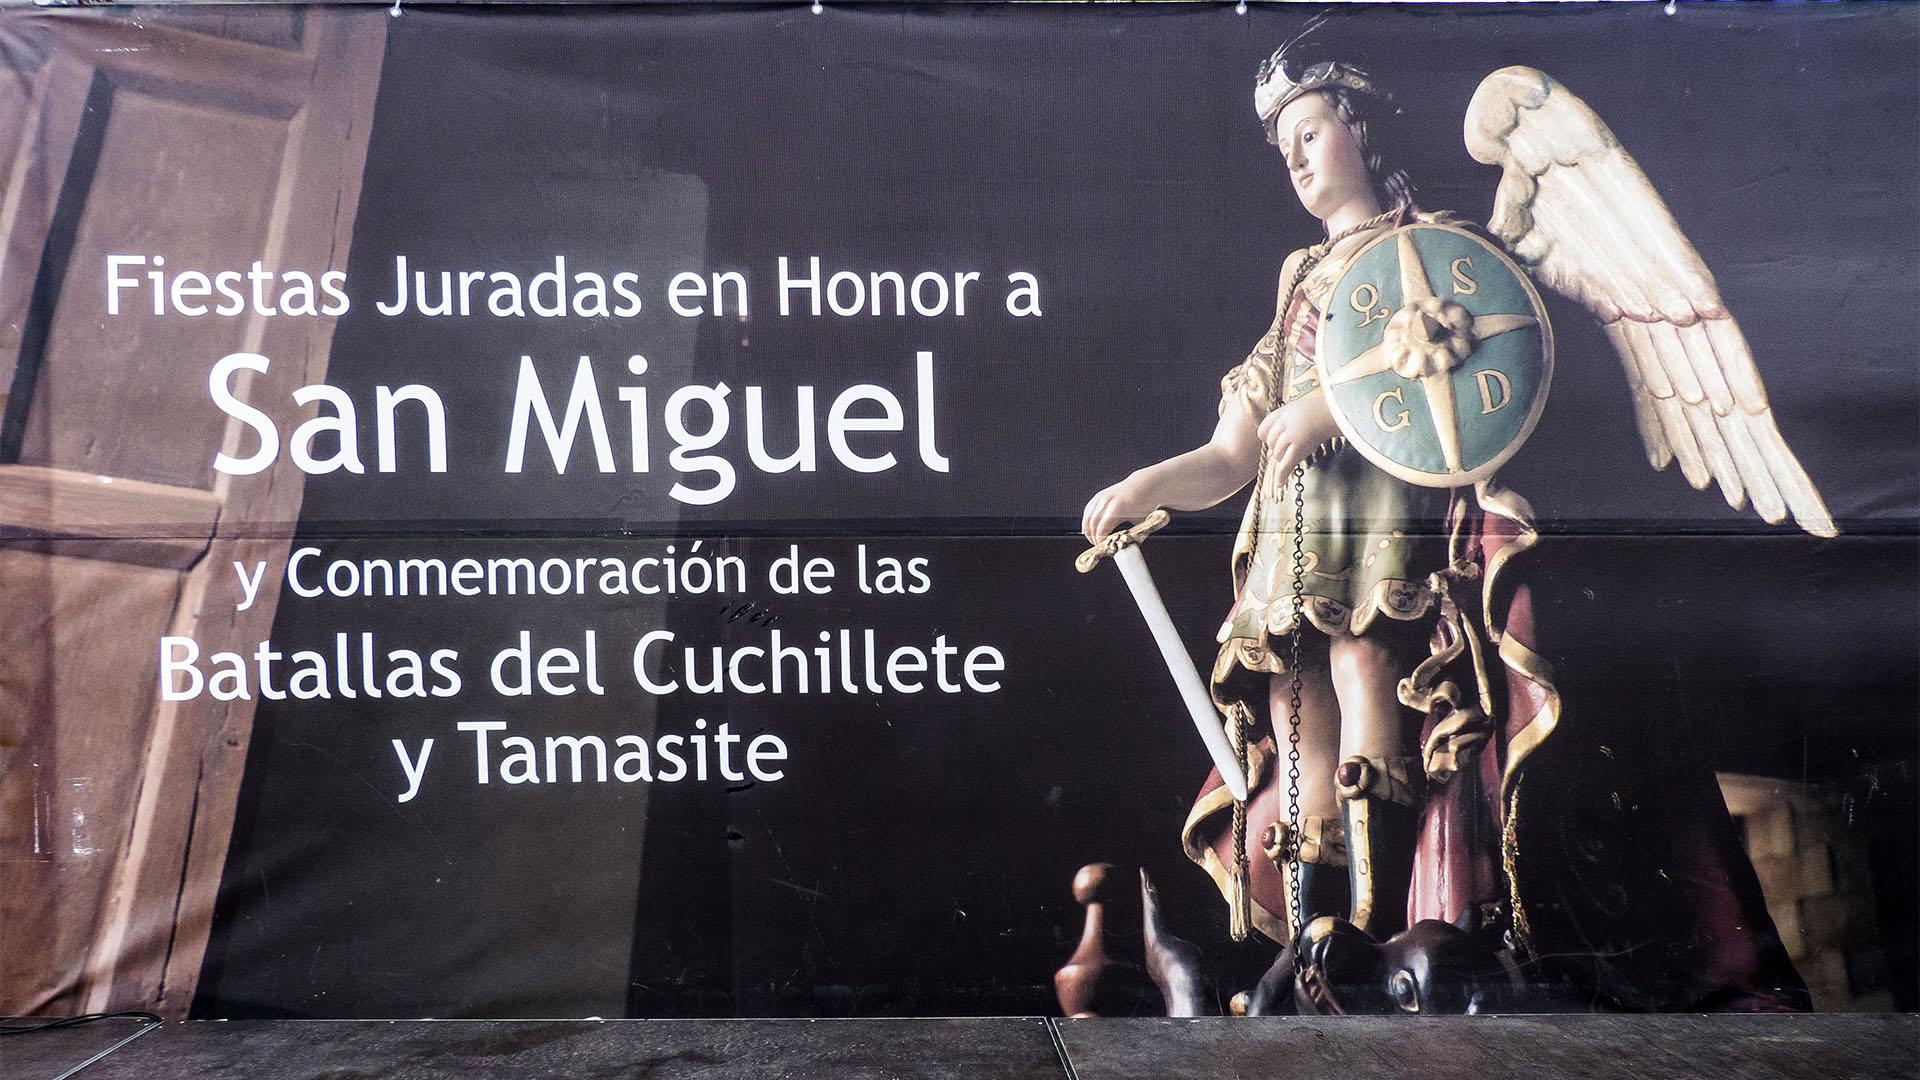 Fiestas + Wallfahrten auf Fuerteventura: Fiesta San Miguel y Batallas del Cuchillete.